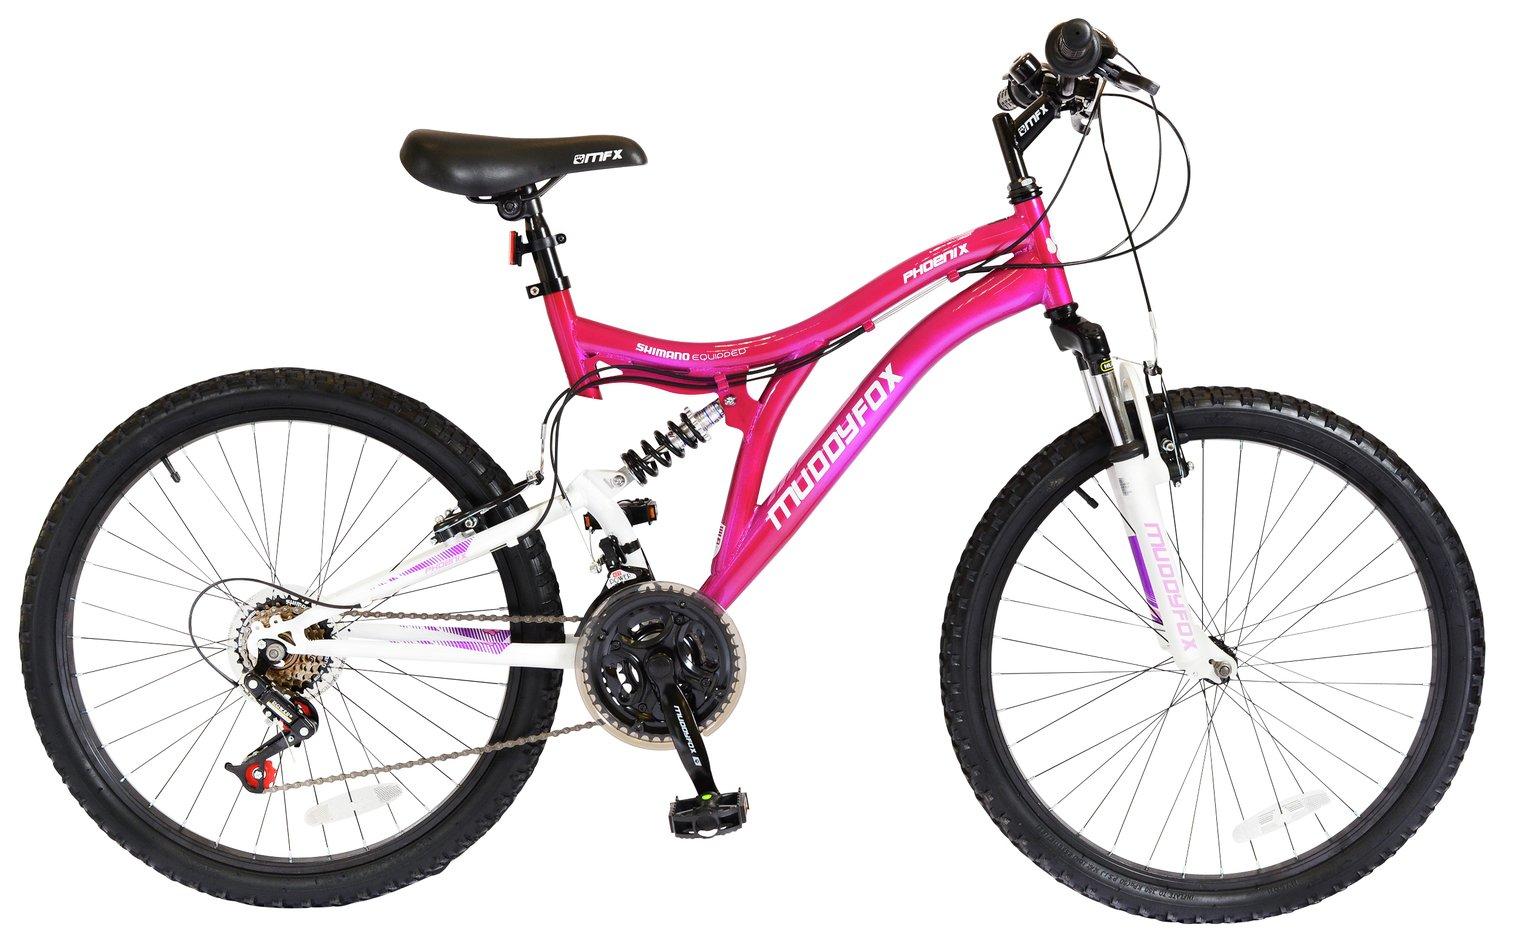 Muddyfox Phoenix 24 Inch Dual Suspension Bike